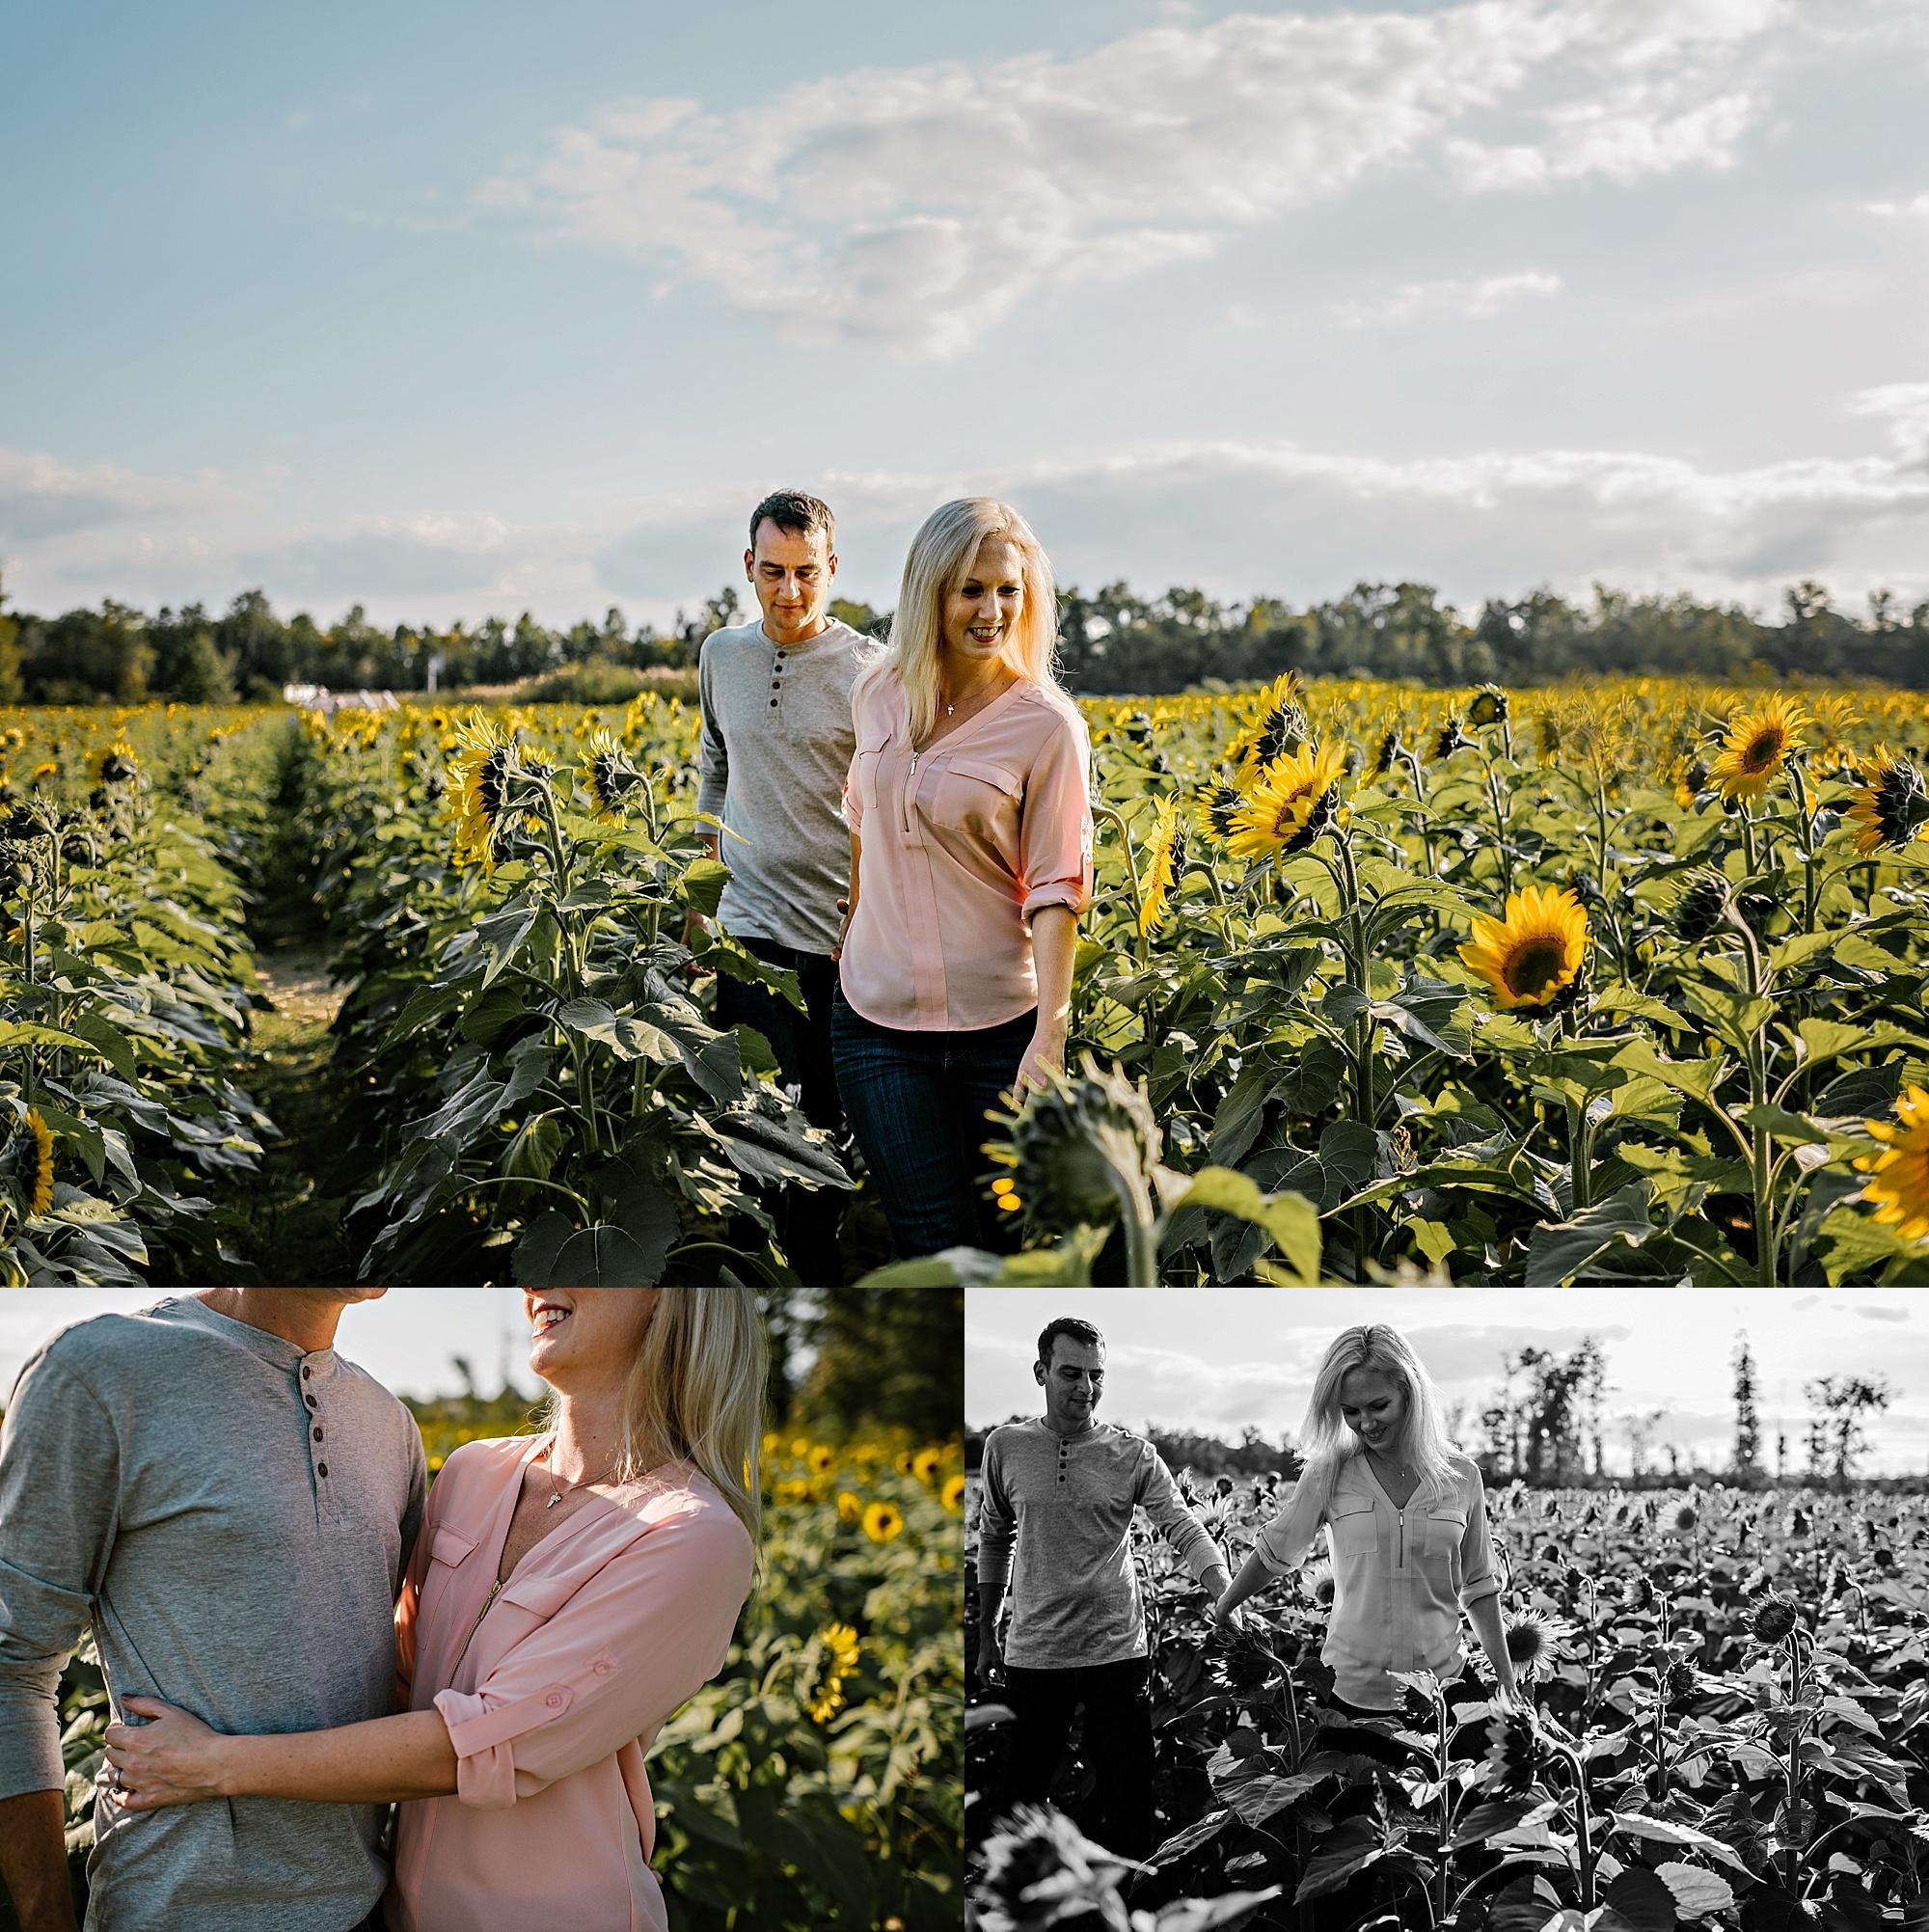 Lori-and-mike-akron-ohio-photographer-lauren-grayson-sunflower-field-session_0010.jpg